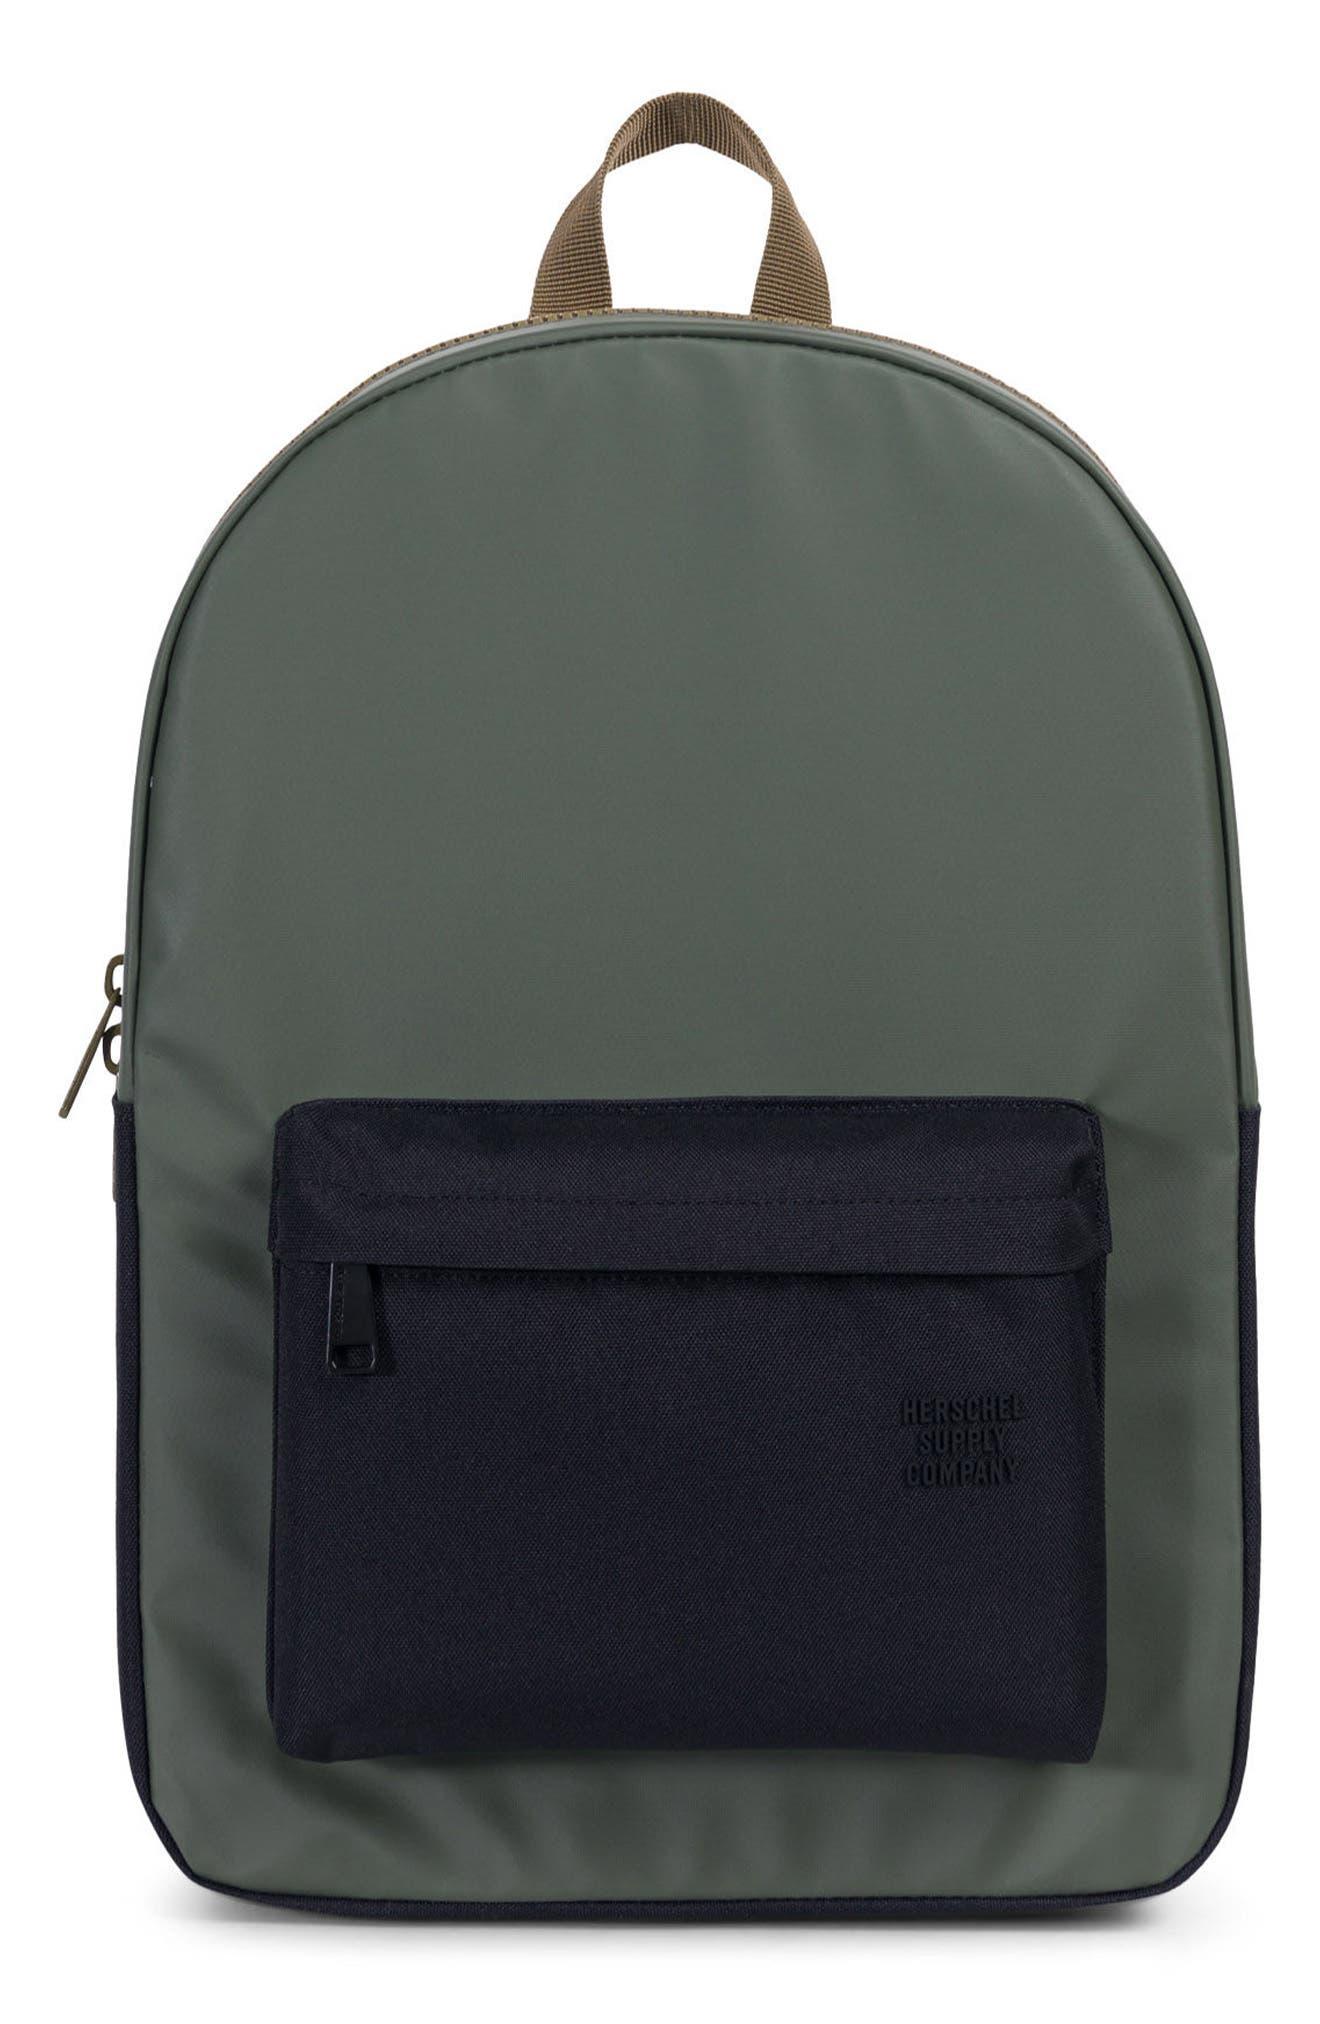 Winlaw Studio Backpack,                         Main,                         color, Beetle Black/ Goth Olive